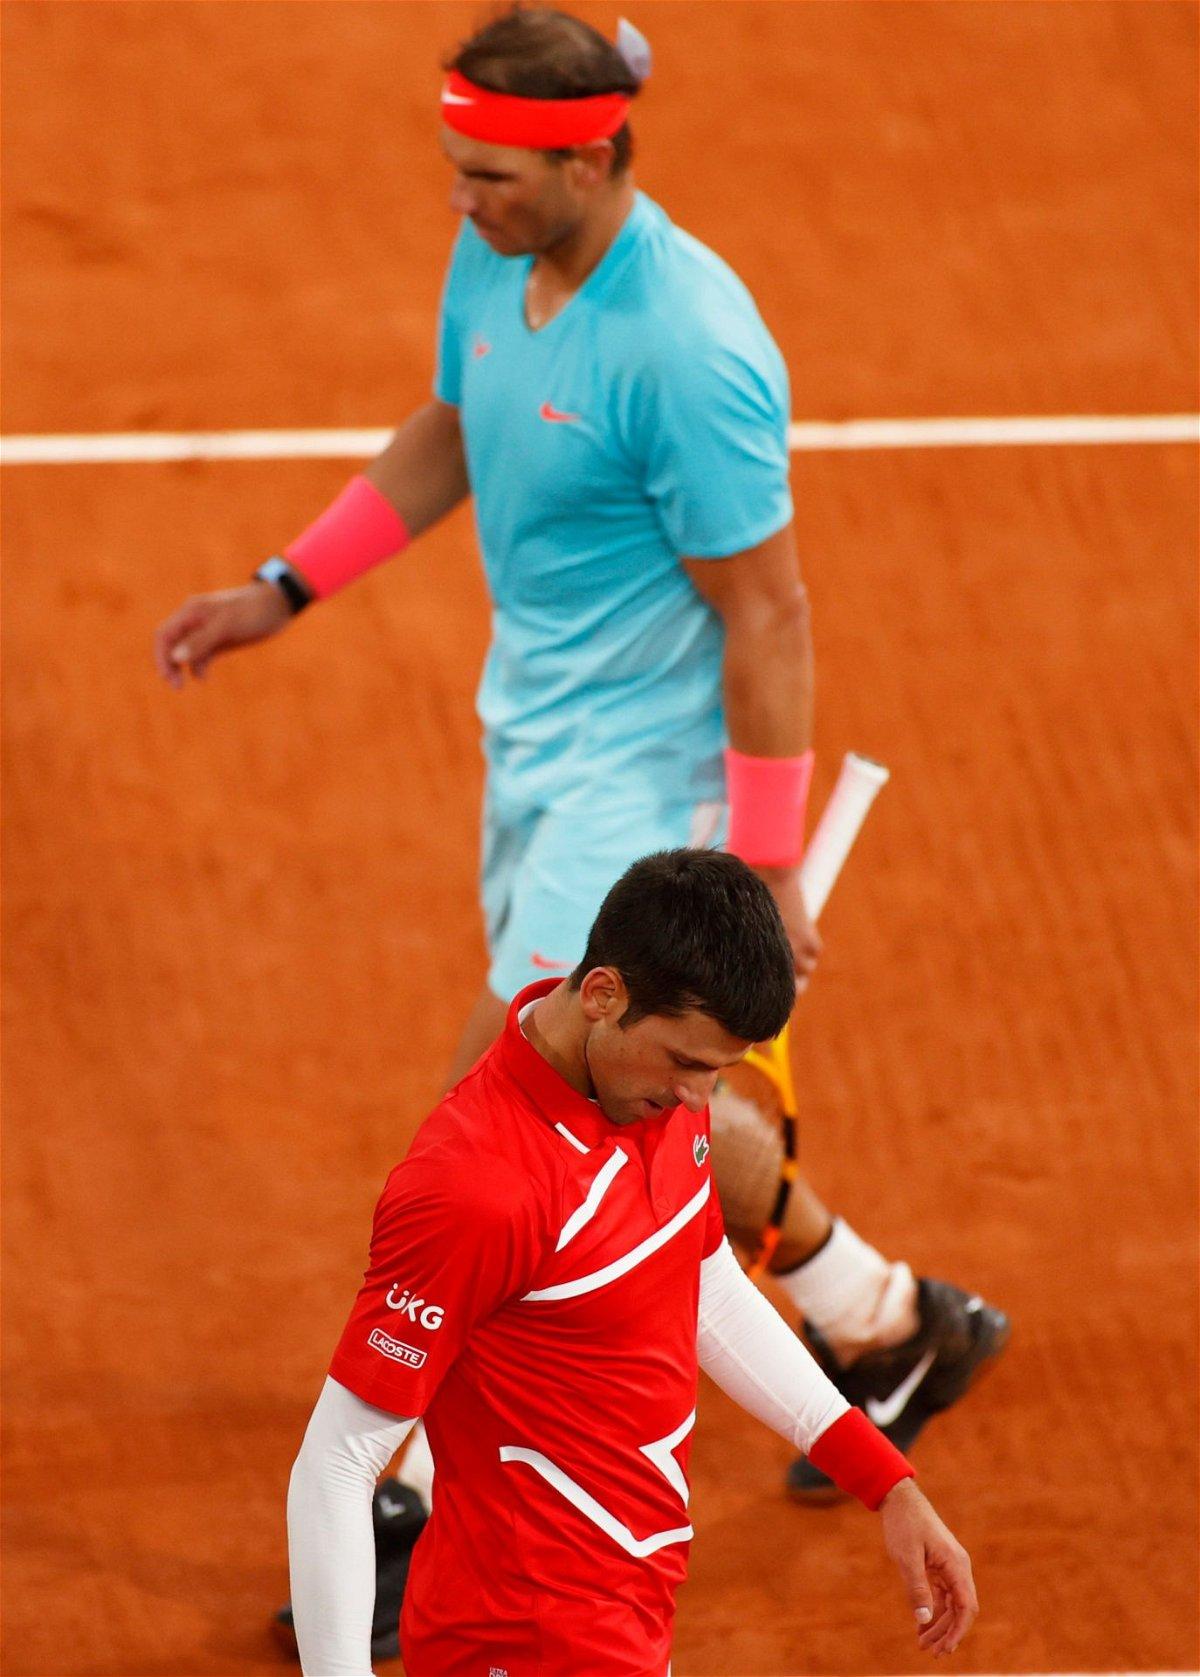 Rafael Nadal and Novak Djokovic at French Open 2020 Finals